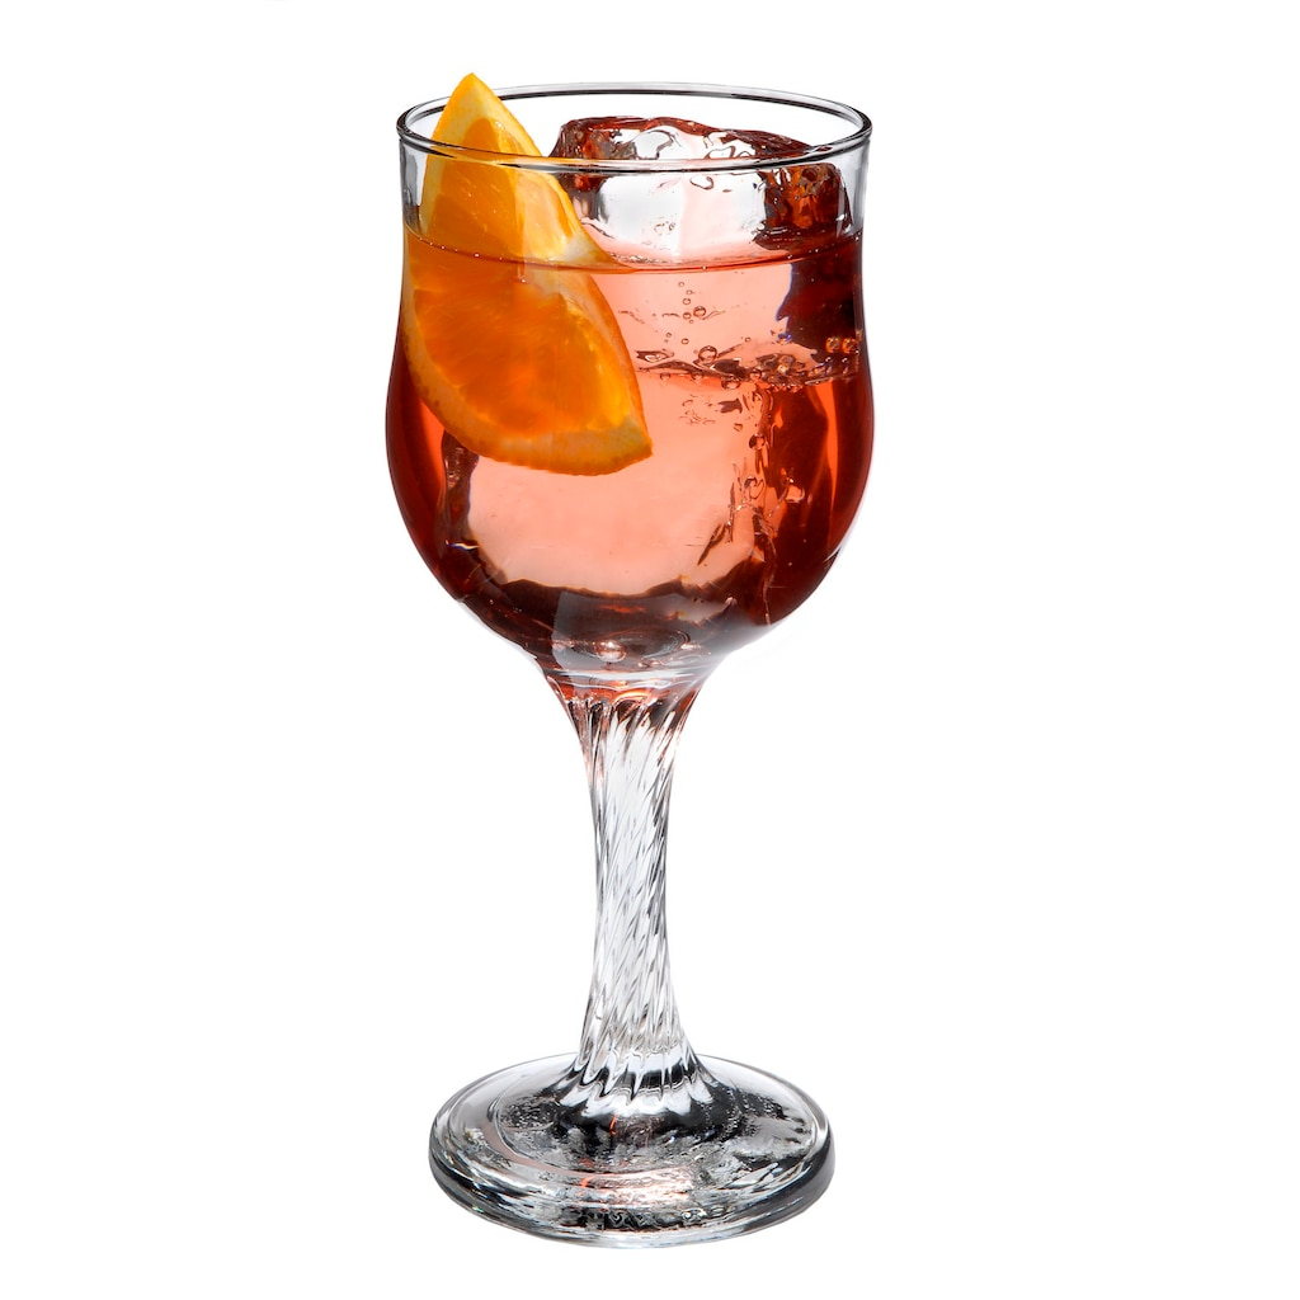 95a54ae10e8 Elegant Twisted Stem Wine Glasses with Bud-Shaped Bowls